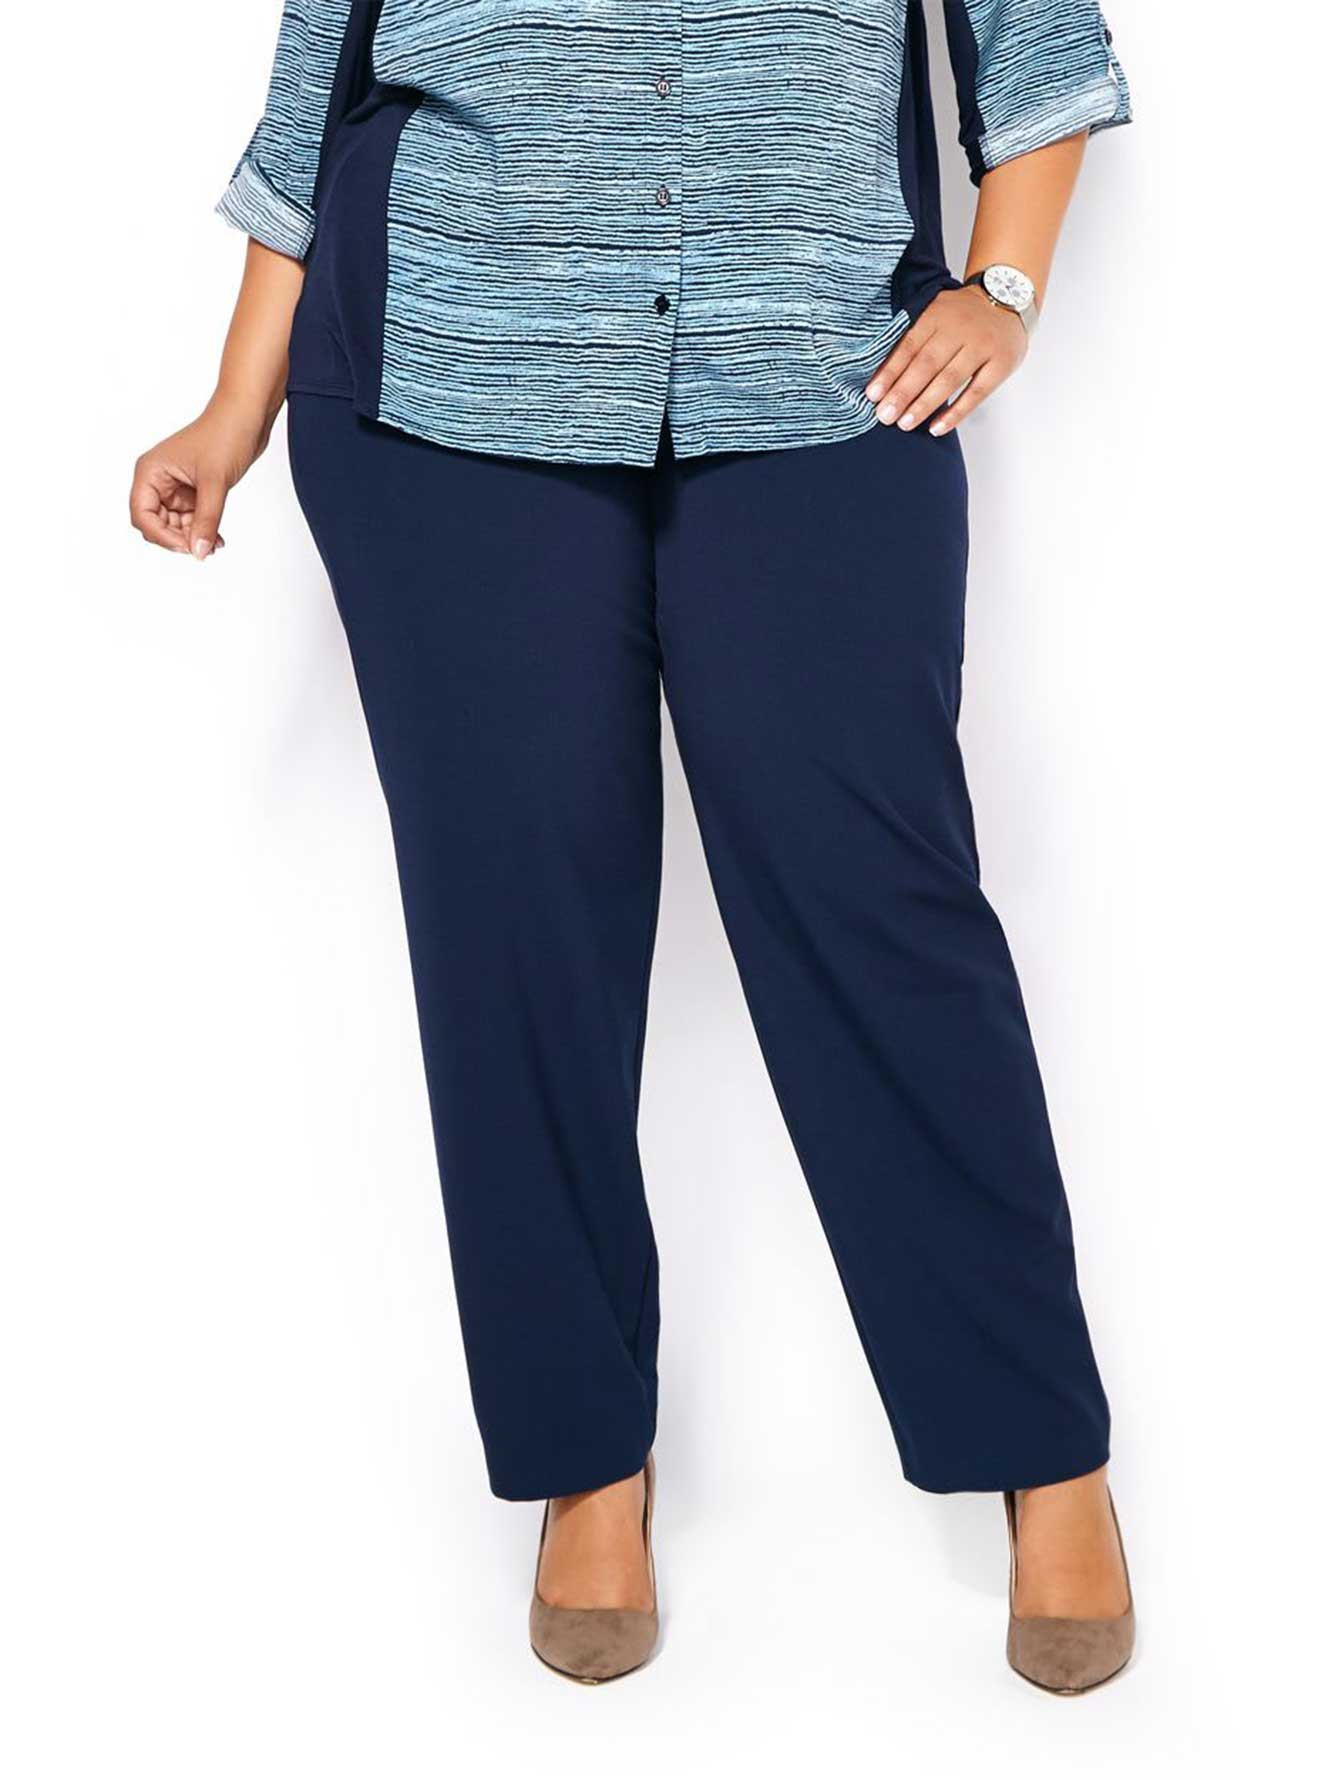 4bb8dd2c4c9 Petite - Curvy Fit Straight Leg Pant